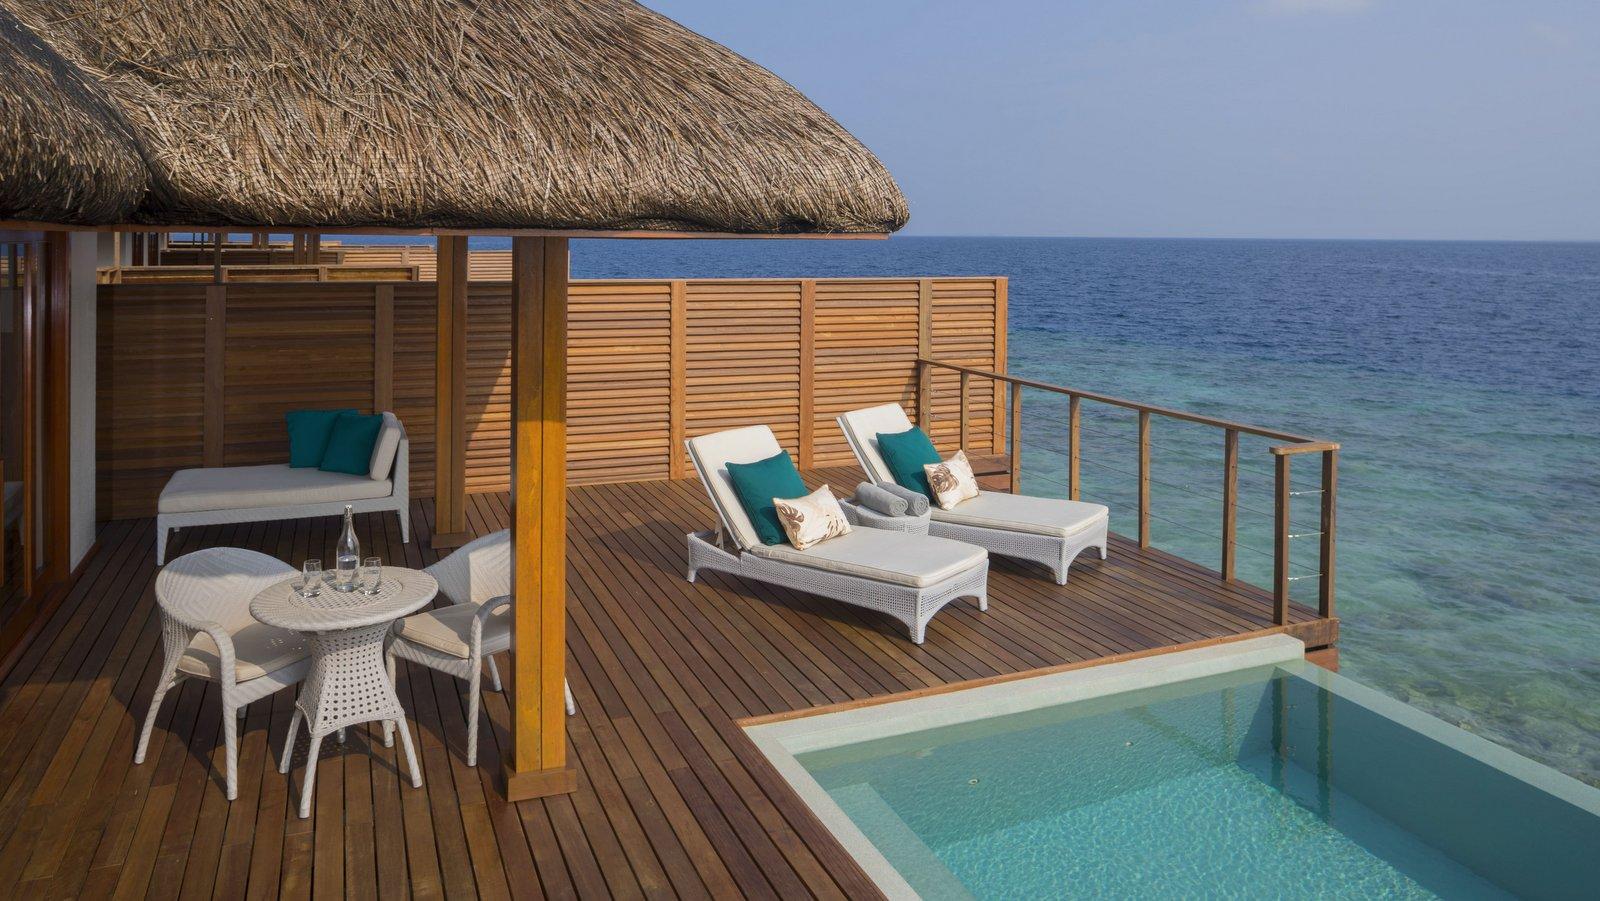 Мальдивы, отель Dusit Thani Maldives, номер Water Villa with Pool